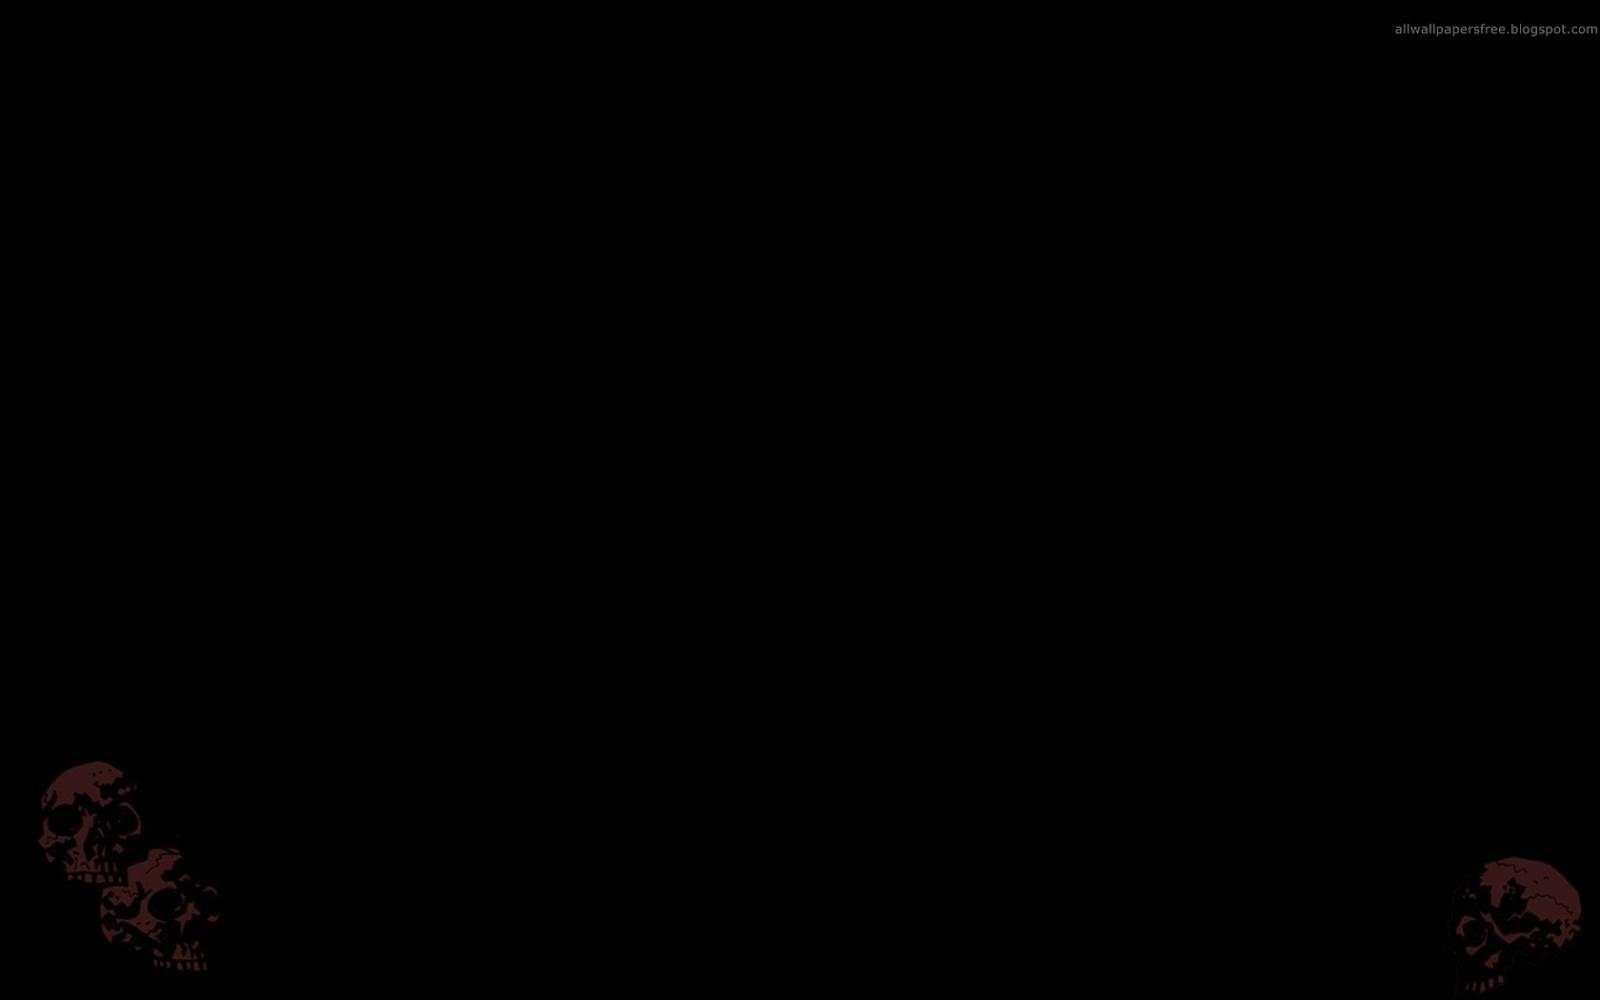 Pure Black Wallpaper HD